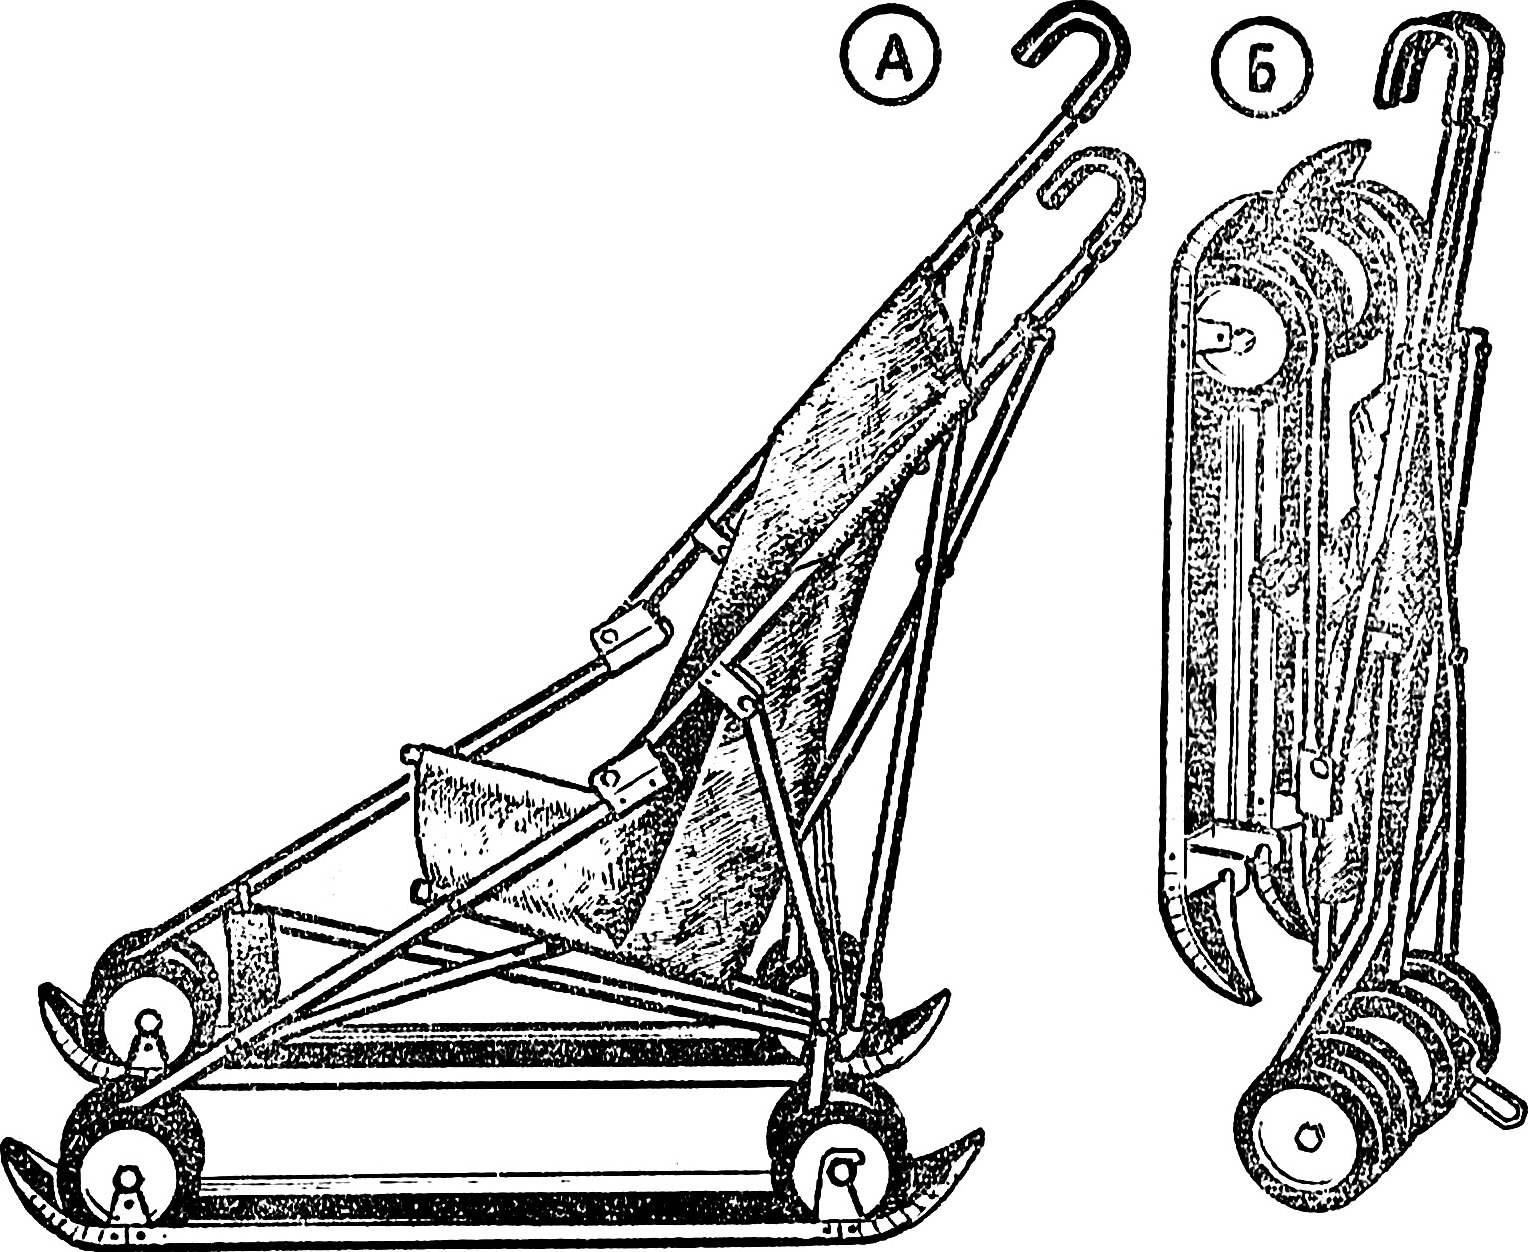 Fig. 1. Stroller skiing.